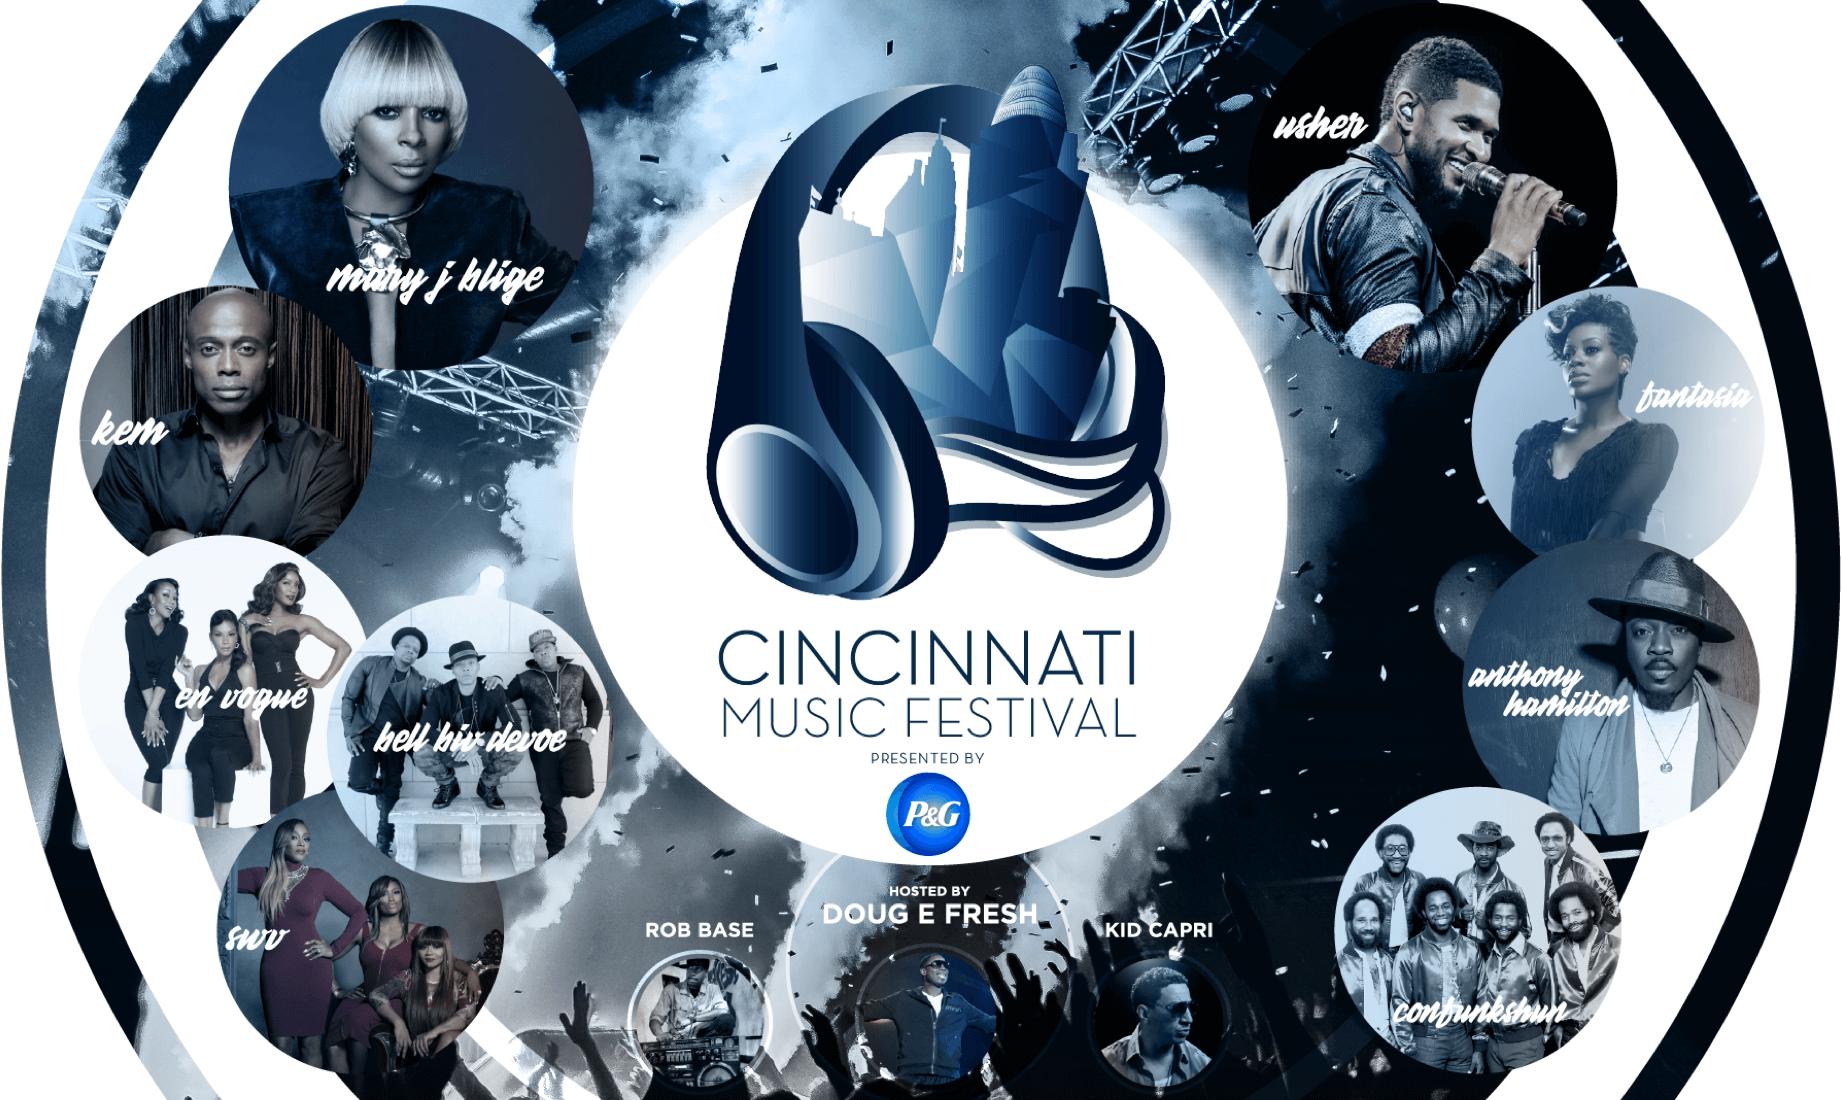 Cincinnati Music Festival 2017